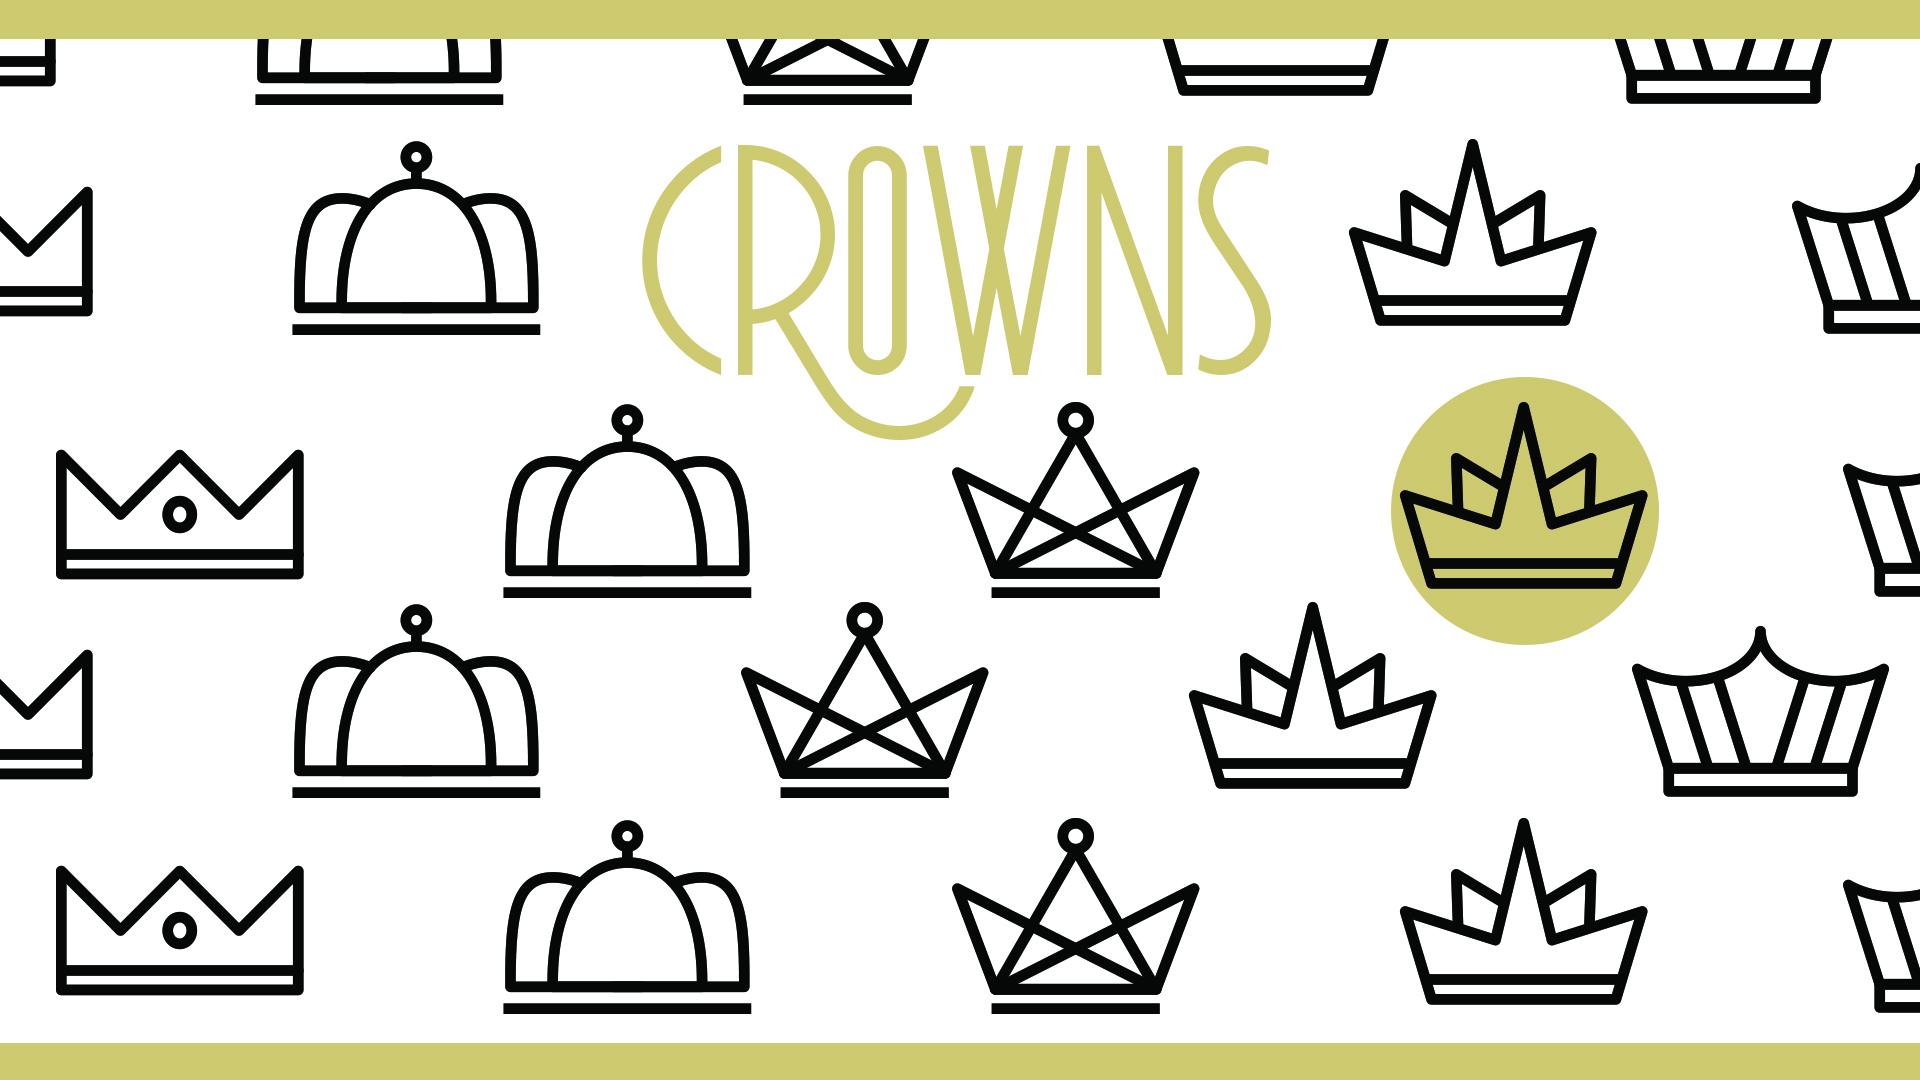 Crowns | Pt. 2